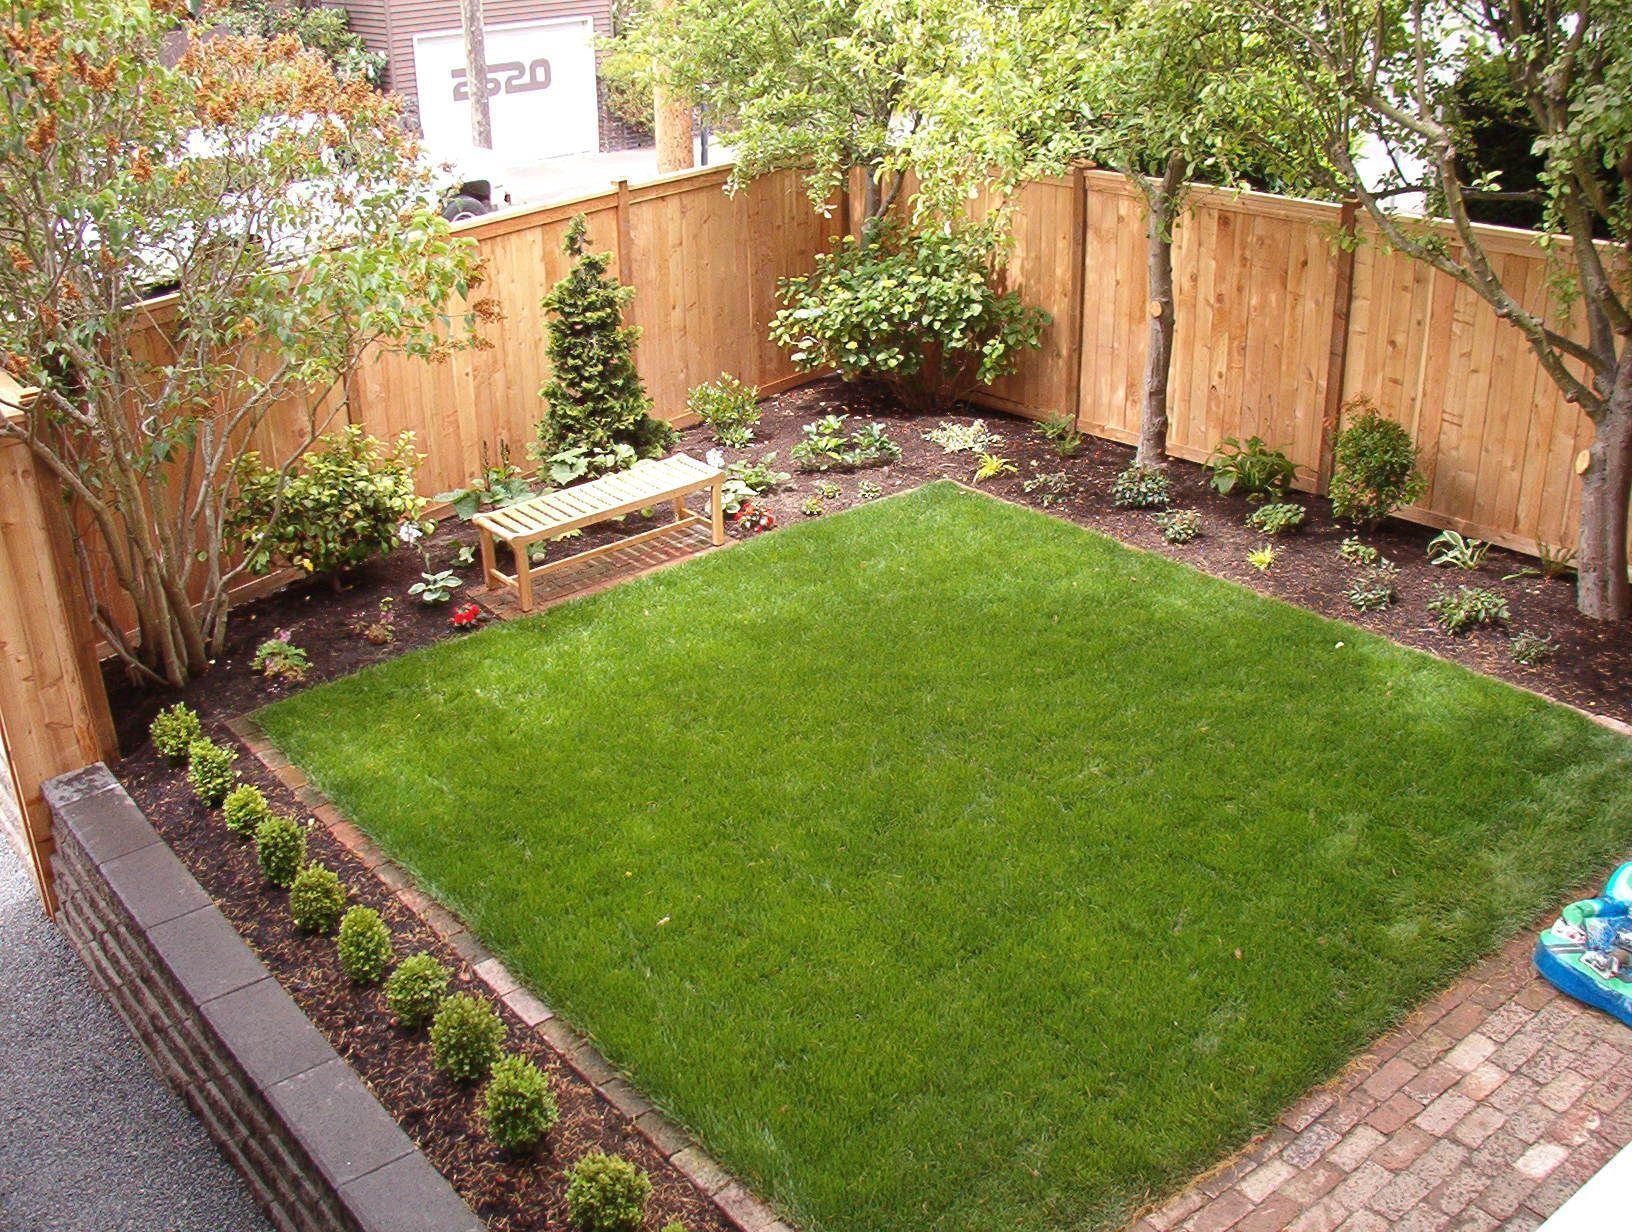 New Backyard Ideas For Small Yards 9602526287 Backyardideasforsmallyards Landscaping Along Fence Backyard Landscaping Designs Front Yard Landscaping Backyard fence landscaping ideas